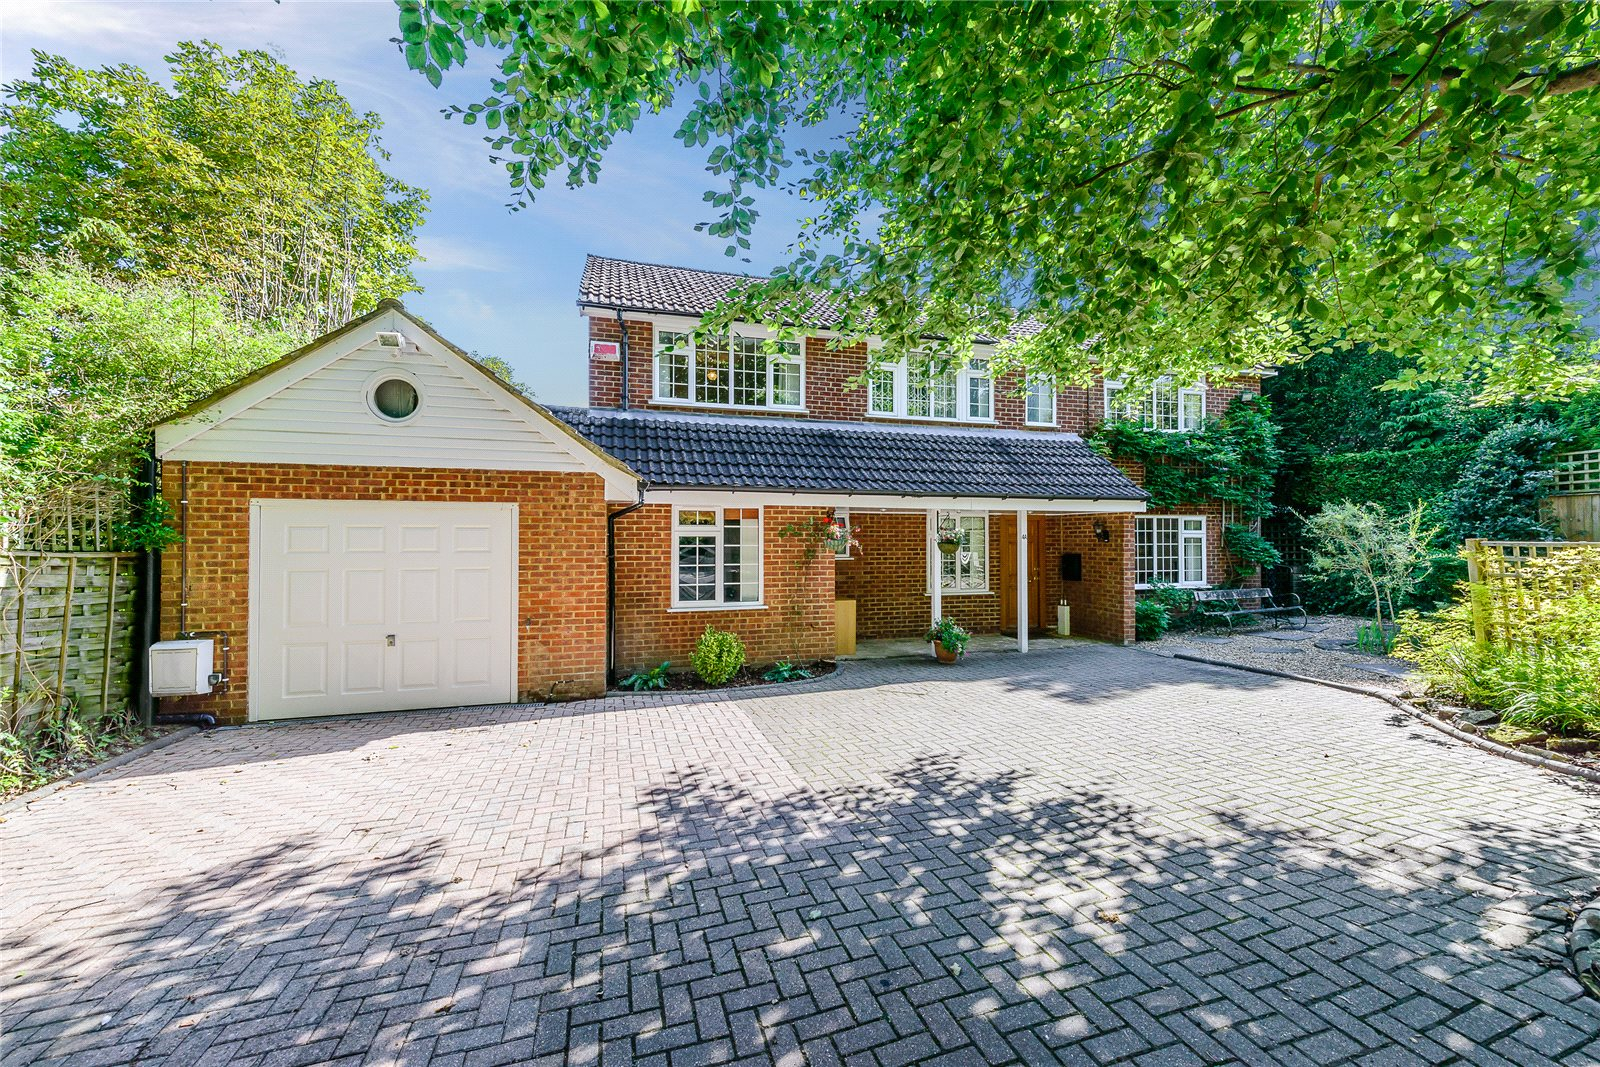 Casa para uma família para Venda às Pit Farm Road, Guildford, Surrey, GU1 Guildford, Inglaterra